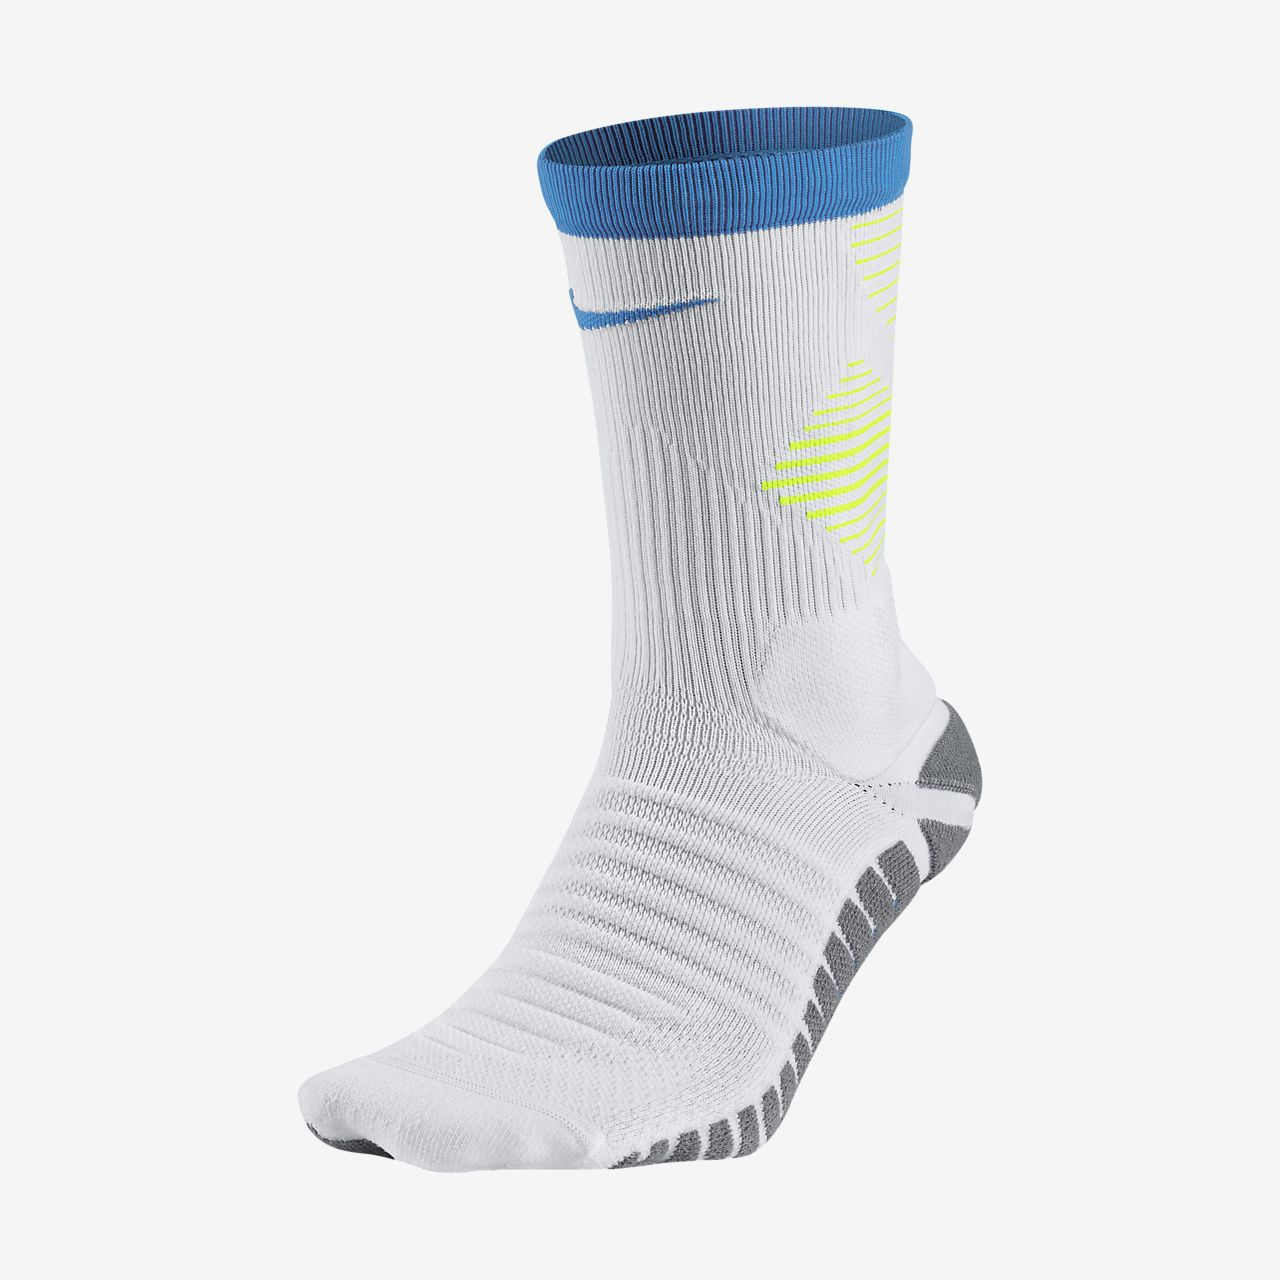 4b14f9068ff526 Nike Strike Mercurial Crew Football Socks. Nike.com AU